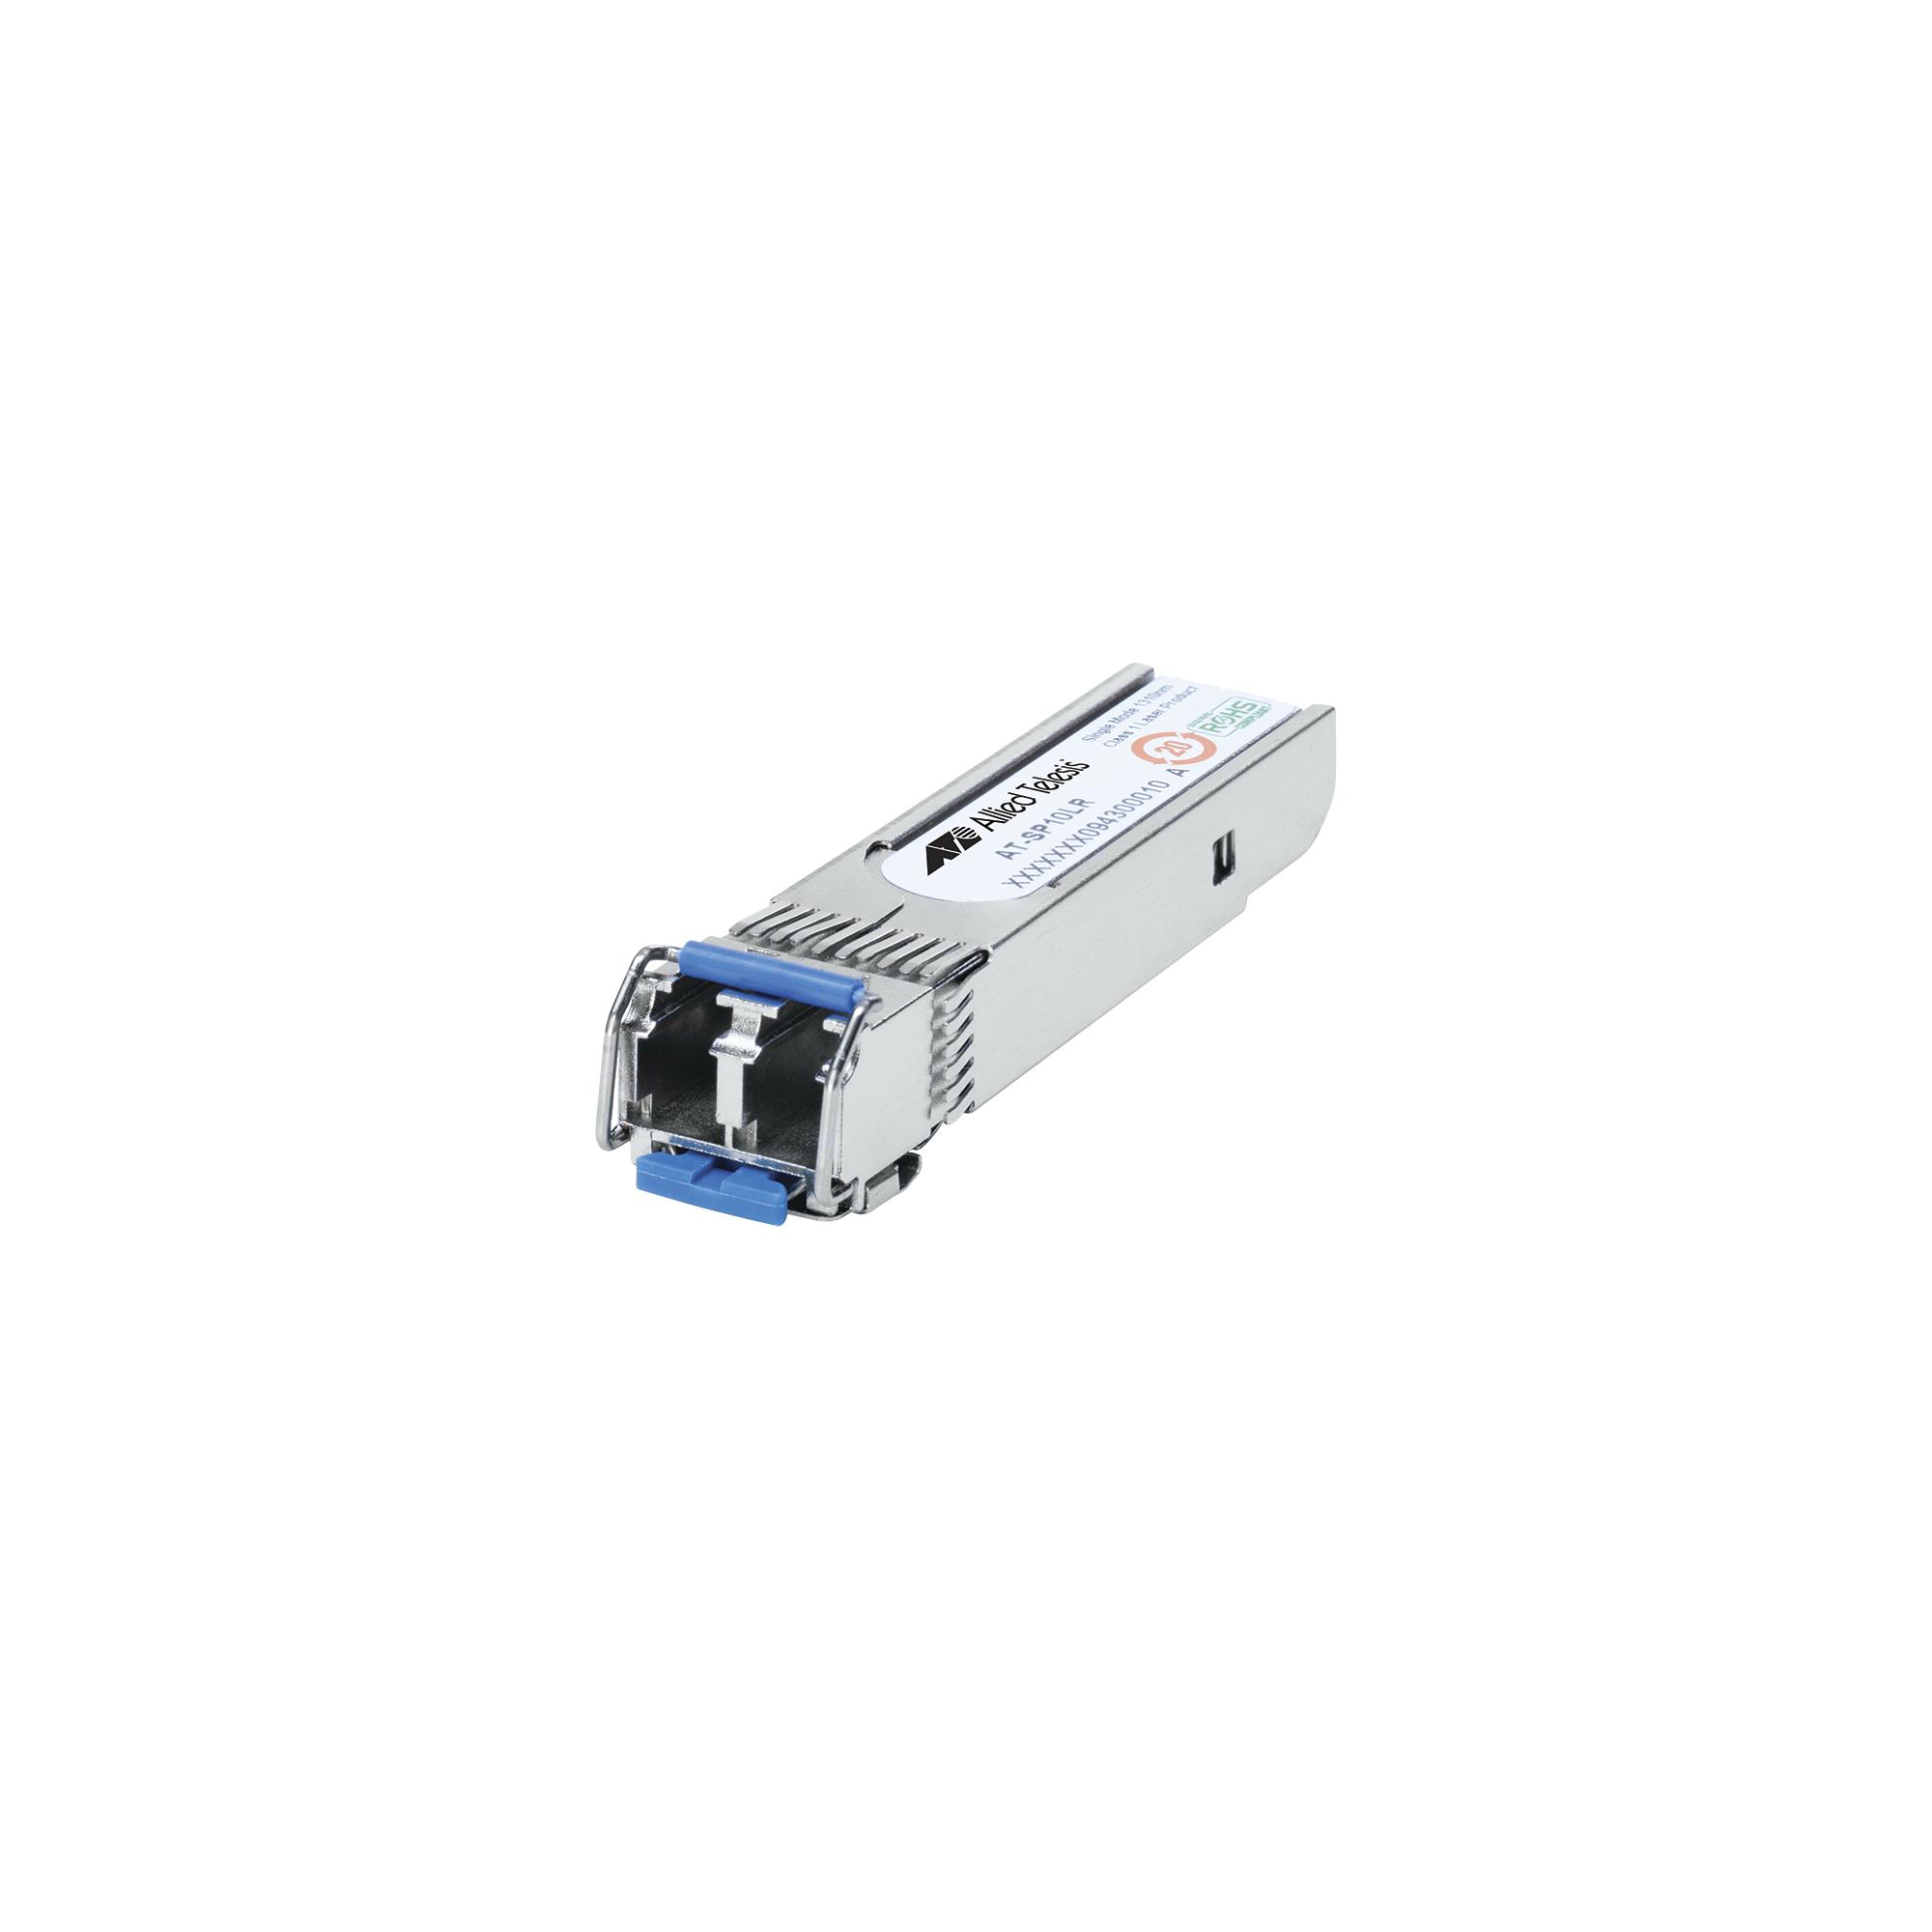 Transceptor MiniGbic SFP+ Monomodo 10G-LR, distancia 10 km conector LC